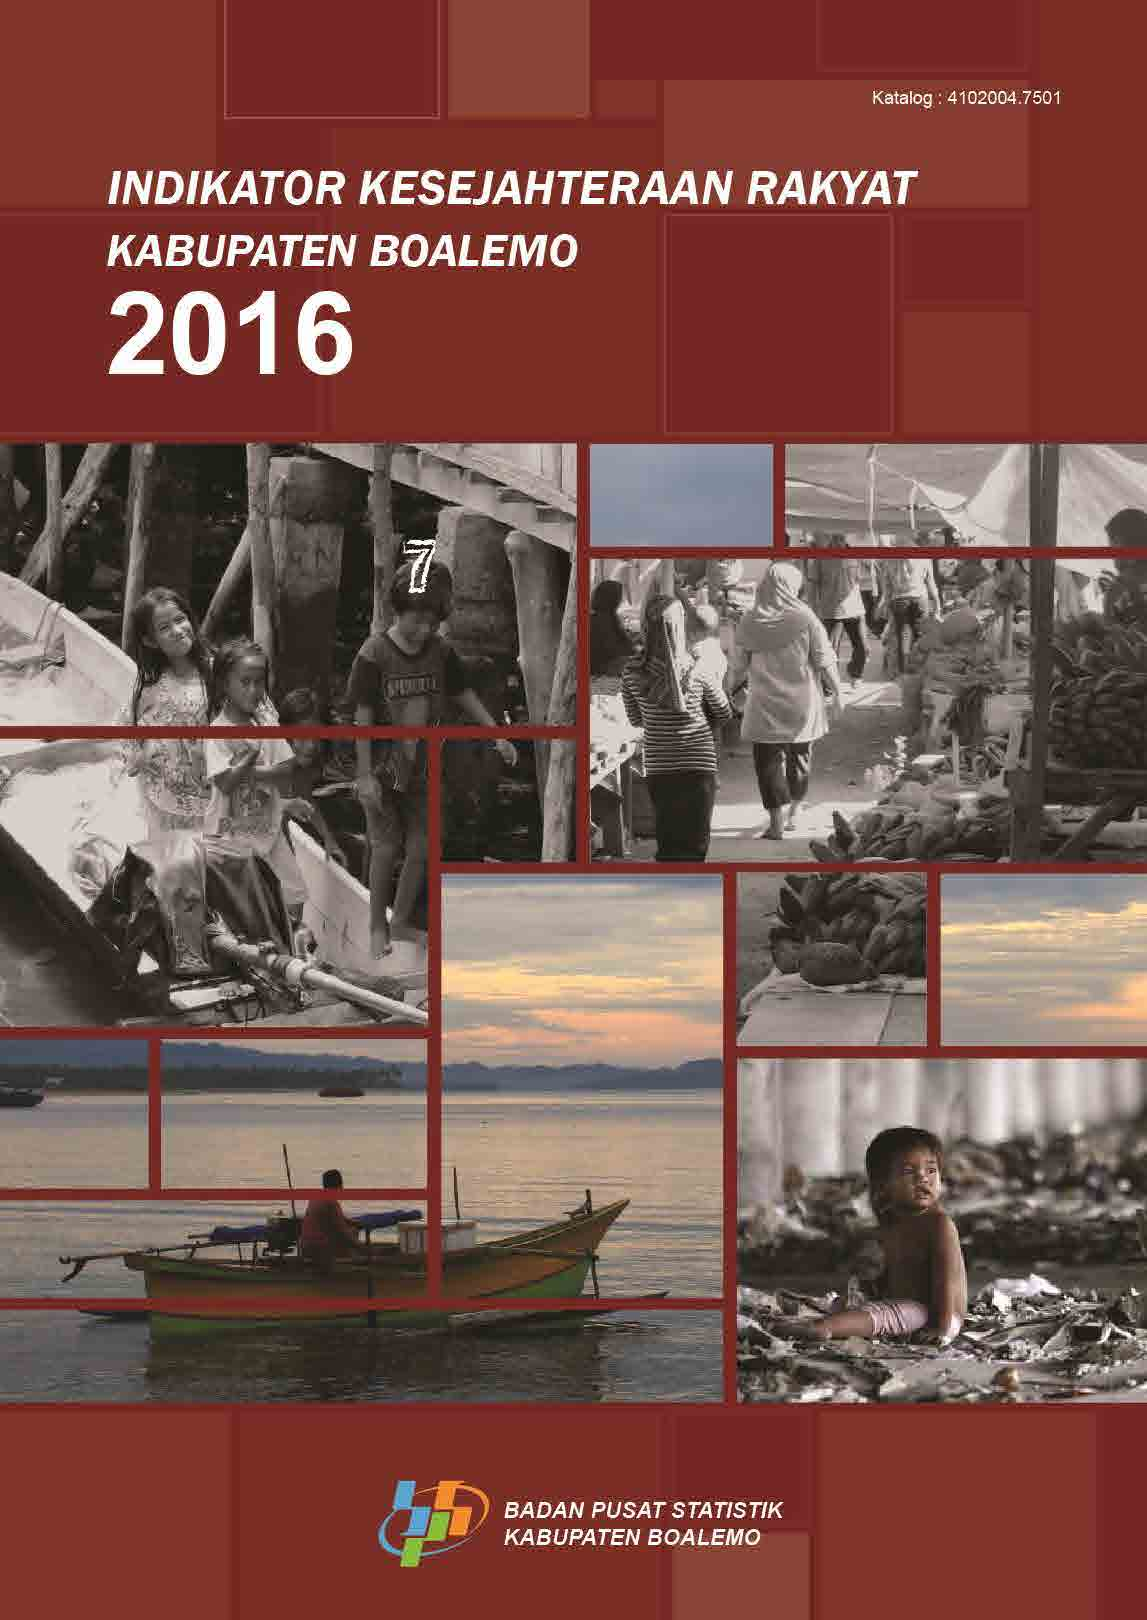 Badan Pusat Statistik Images Unduh Publikasi Indikator Kesejahteraan Rakyat Kabupaten